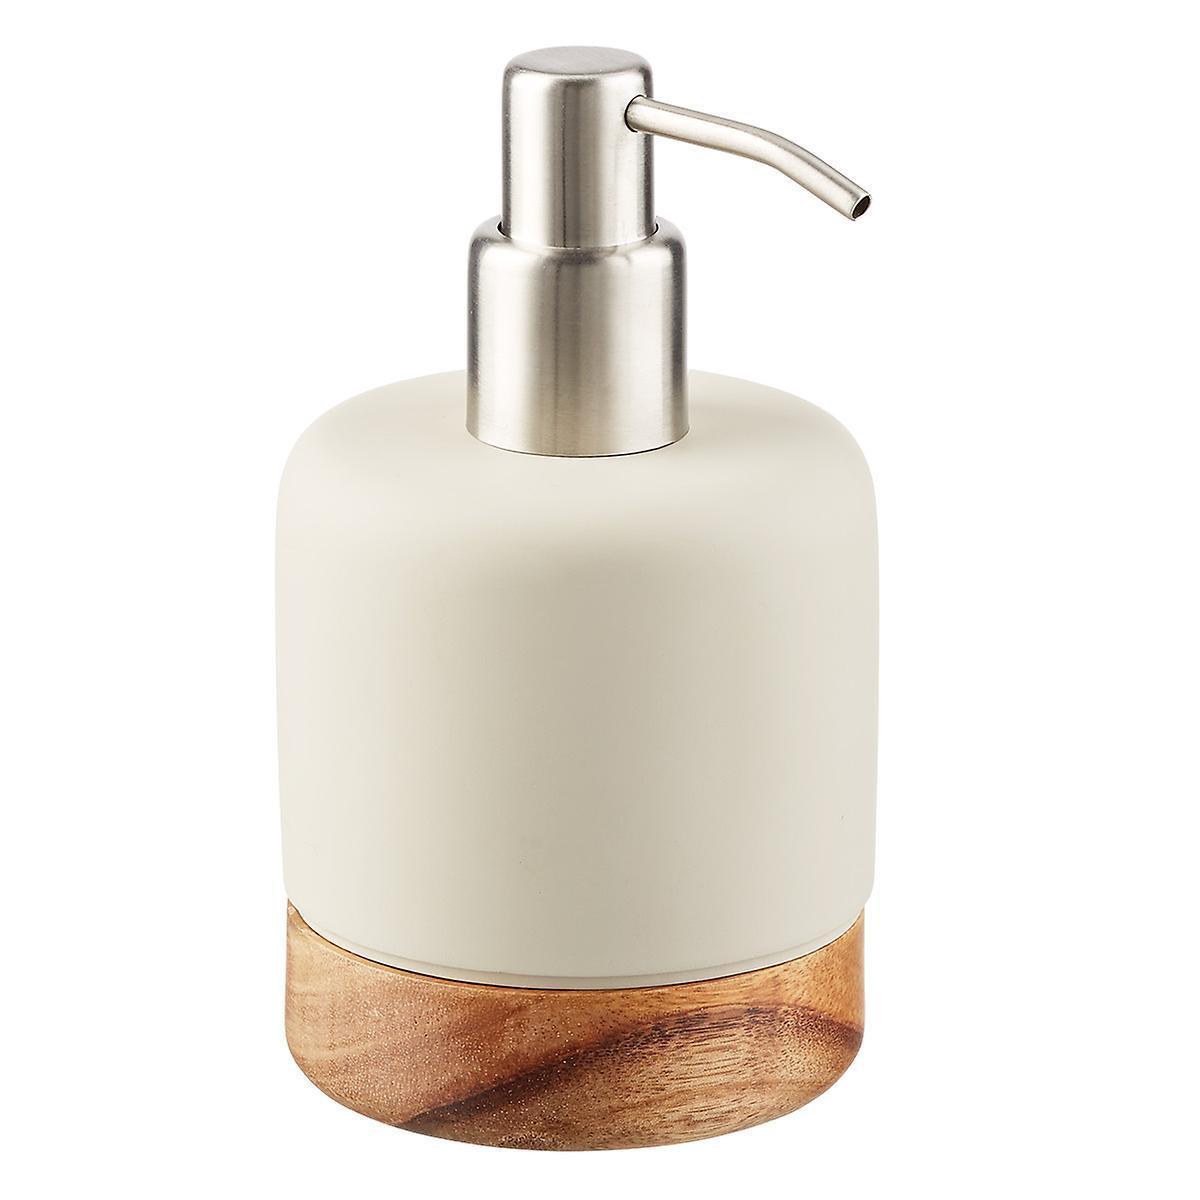 5 oz. Cement & Acacia Soap Dispenser